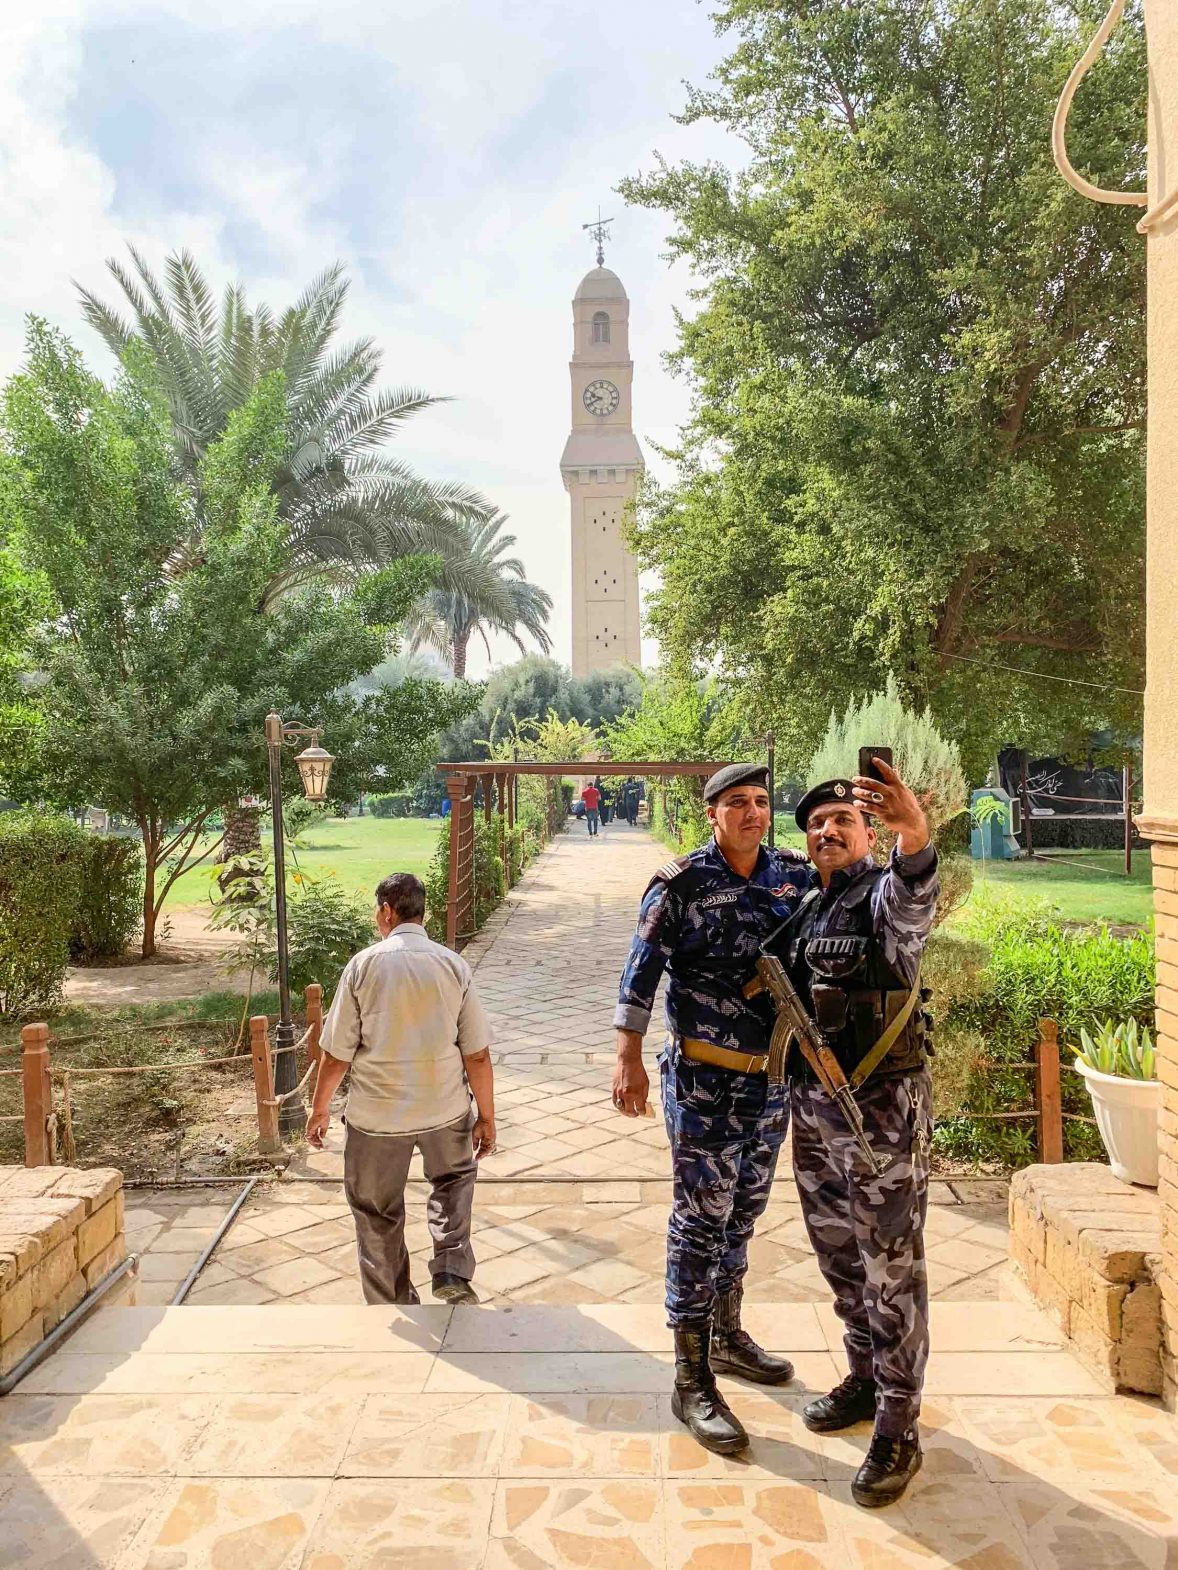 Baghdad 2019: A new era for a much-troubled destination